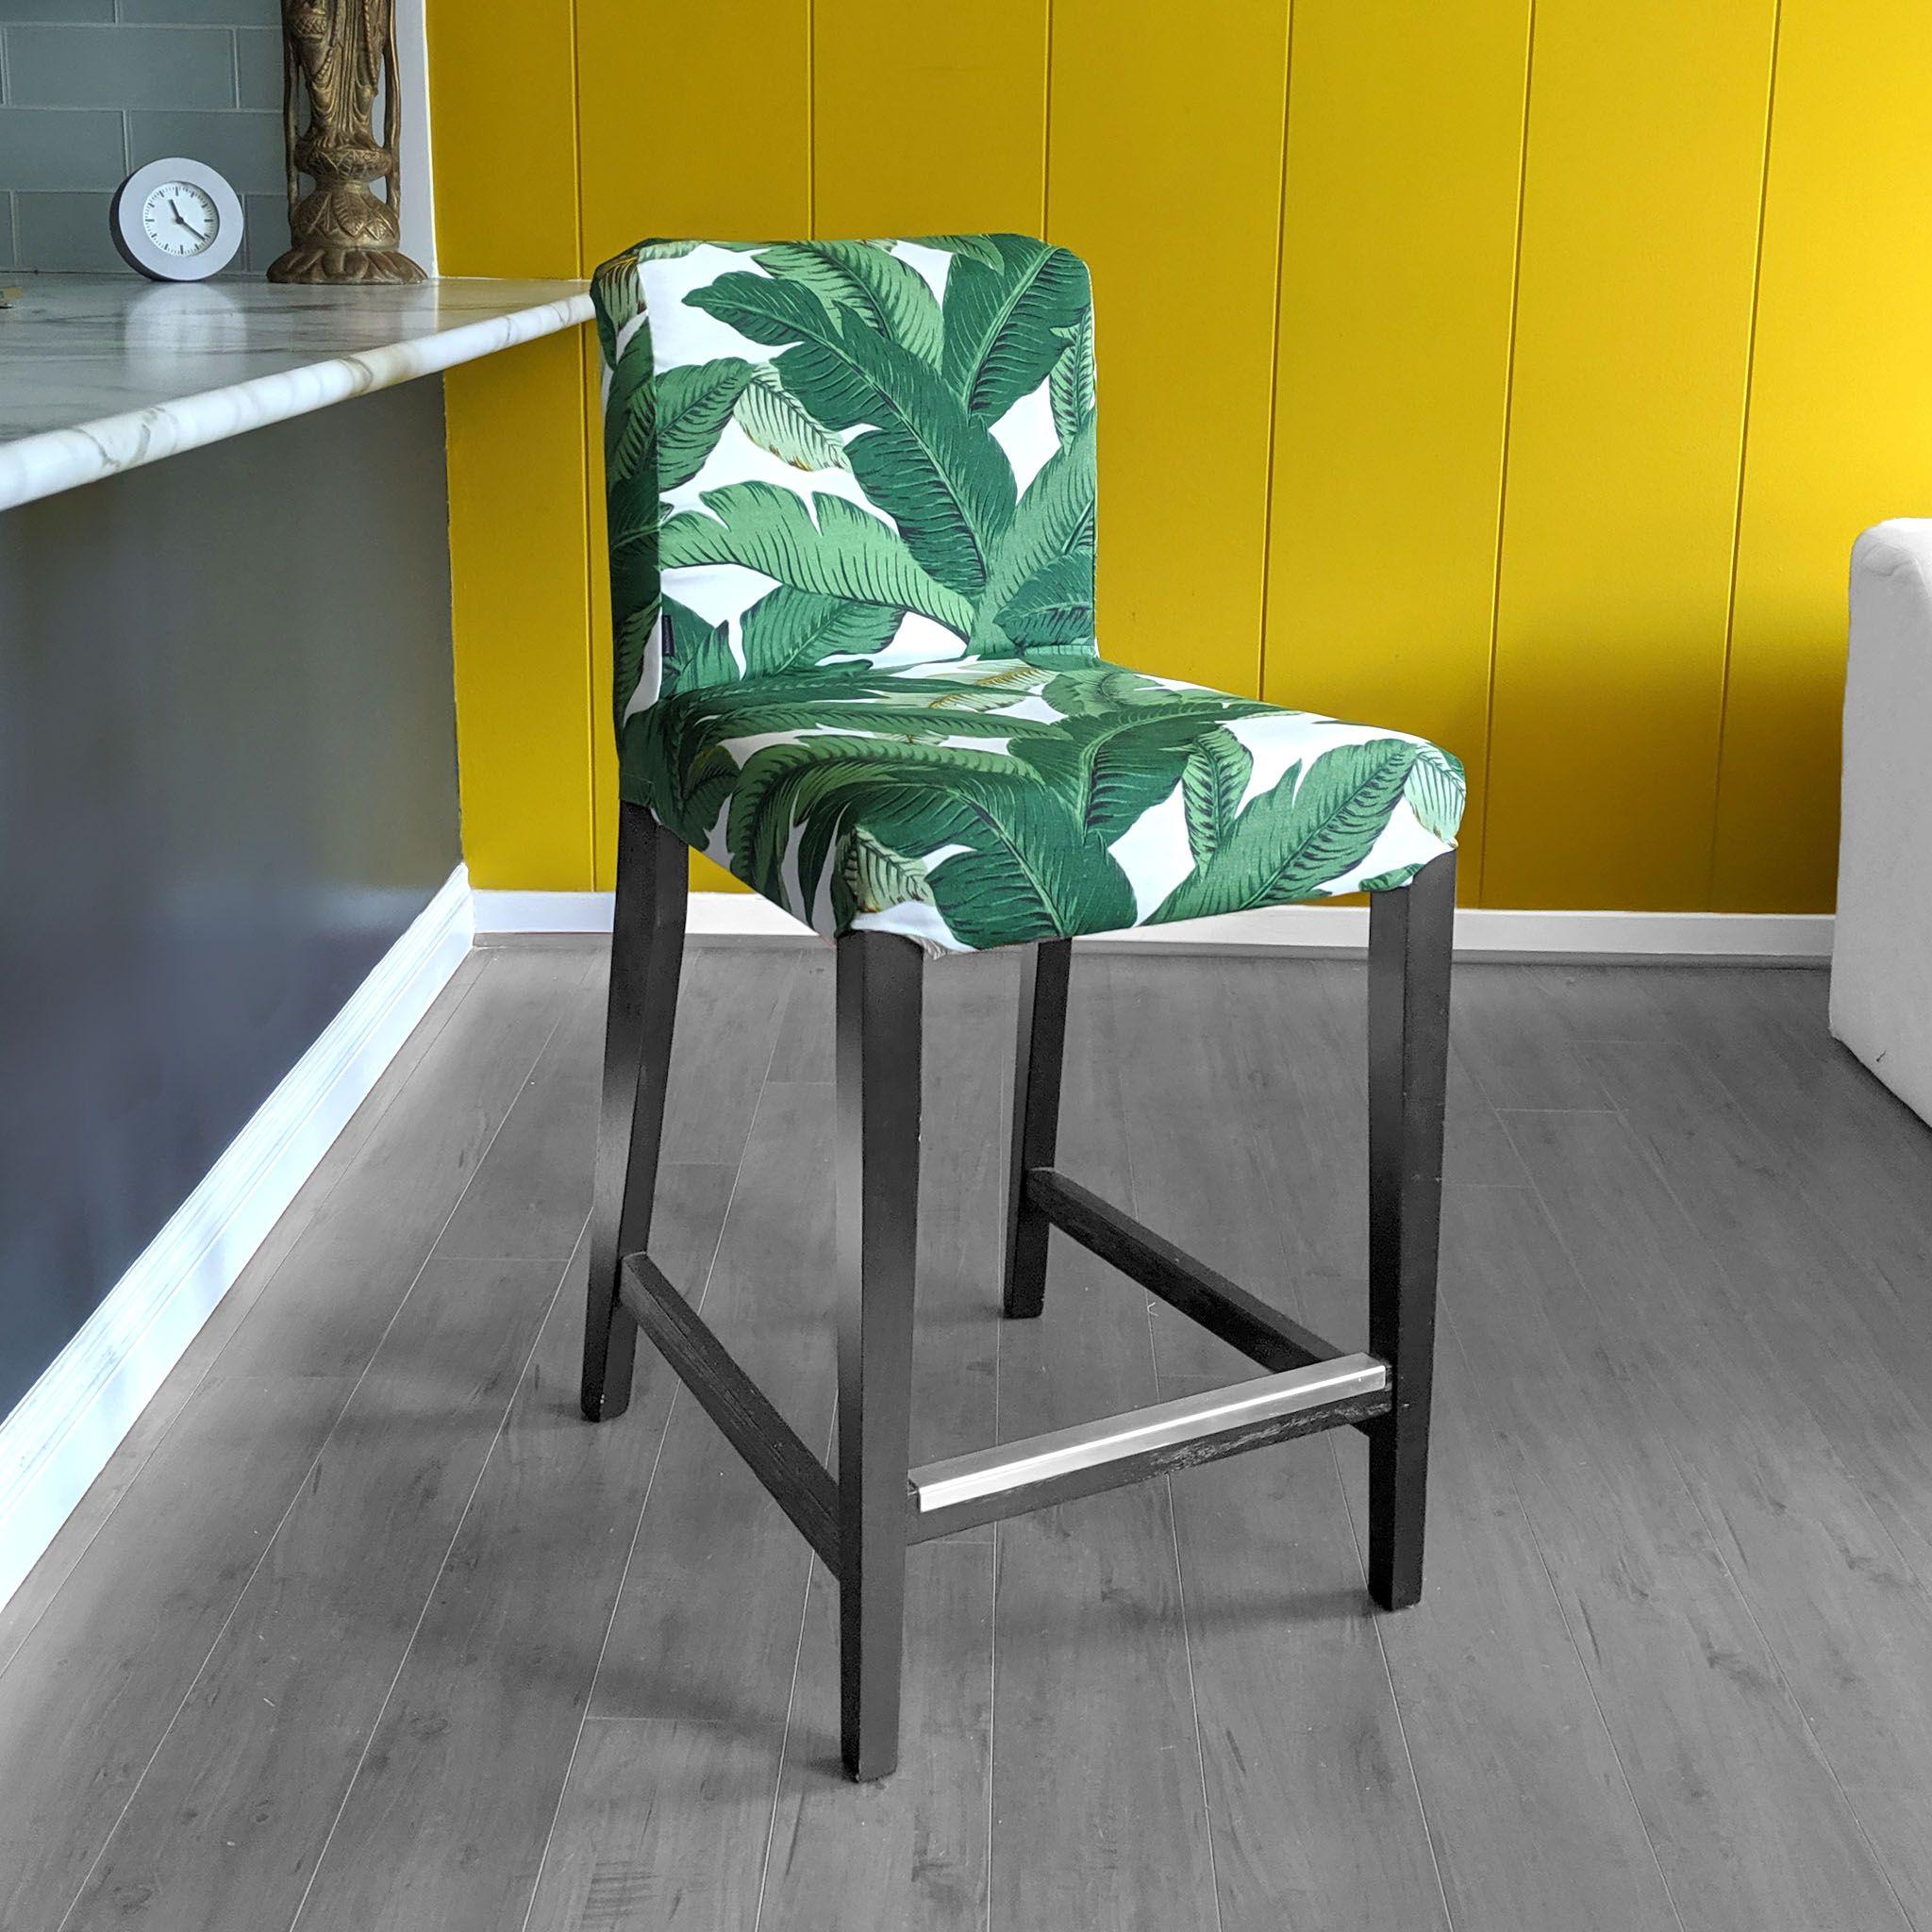 Ikea Henriksdal Barstool Cover Green Banana Leaf Jungle Print